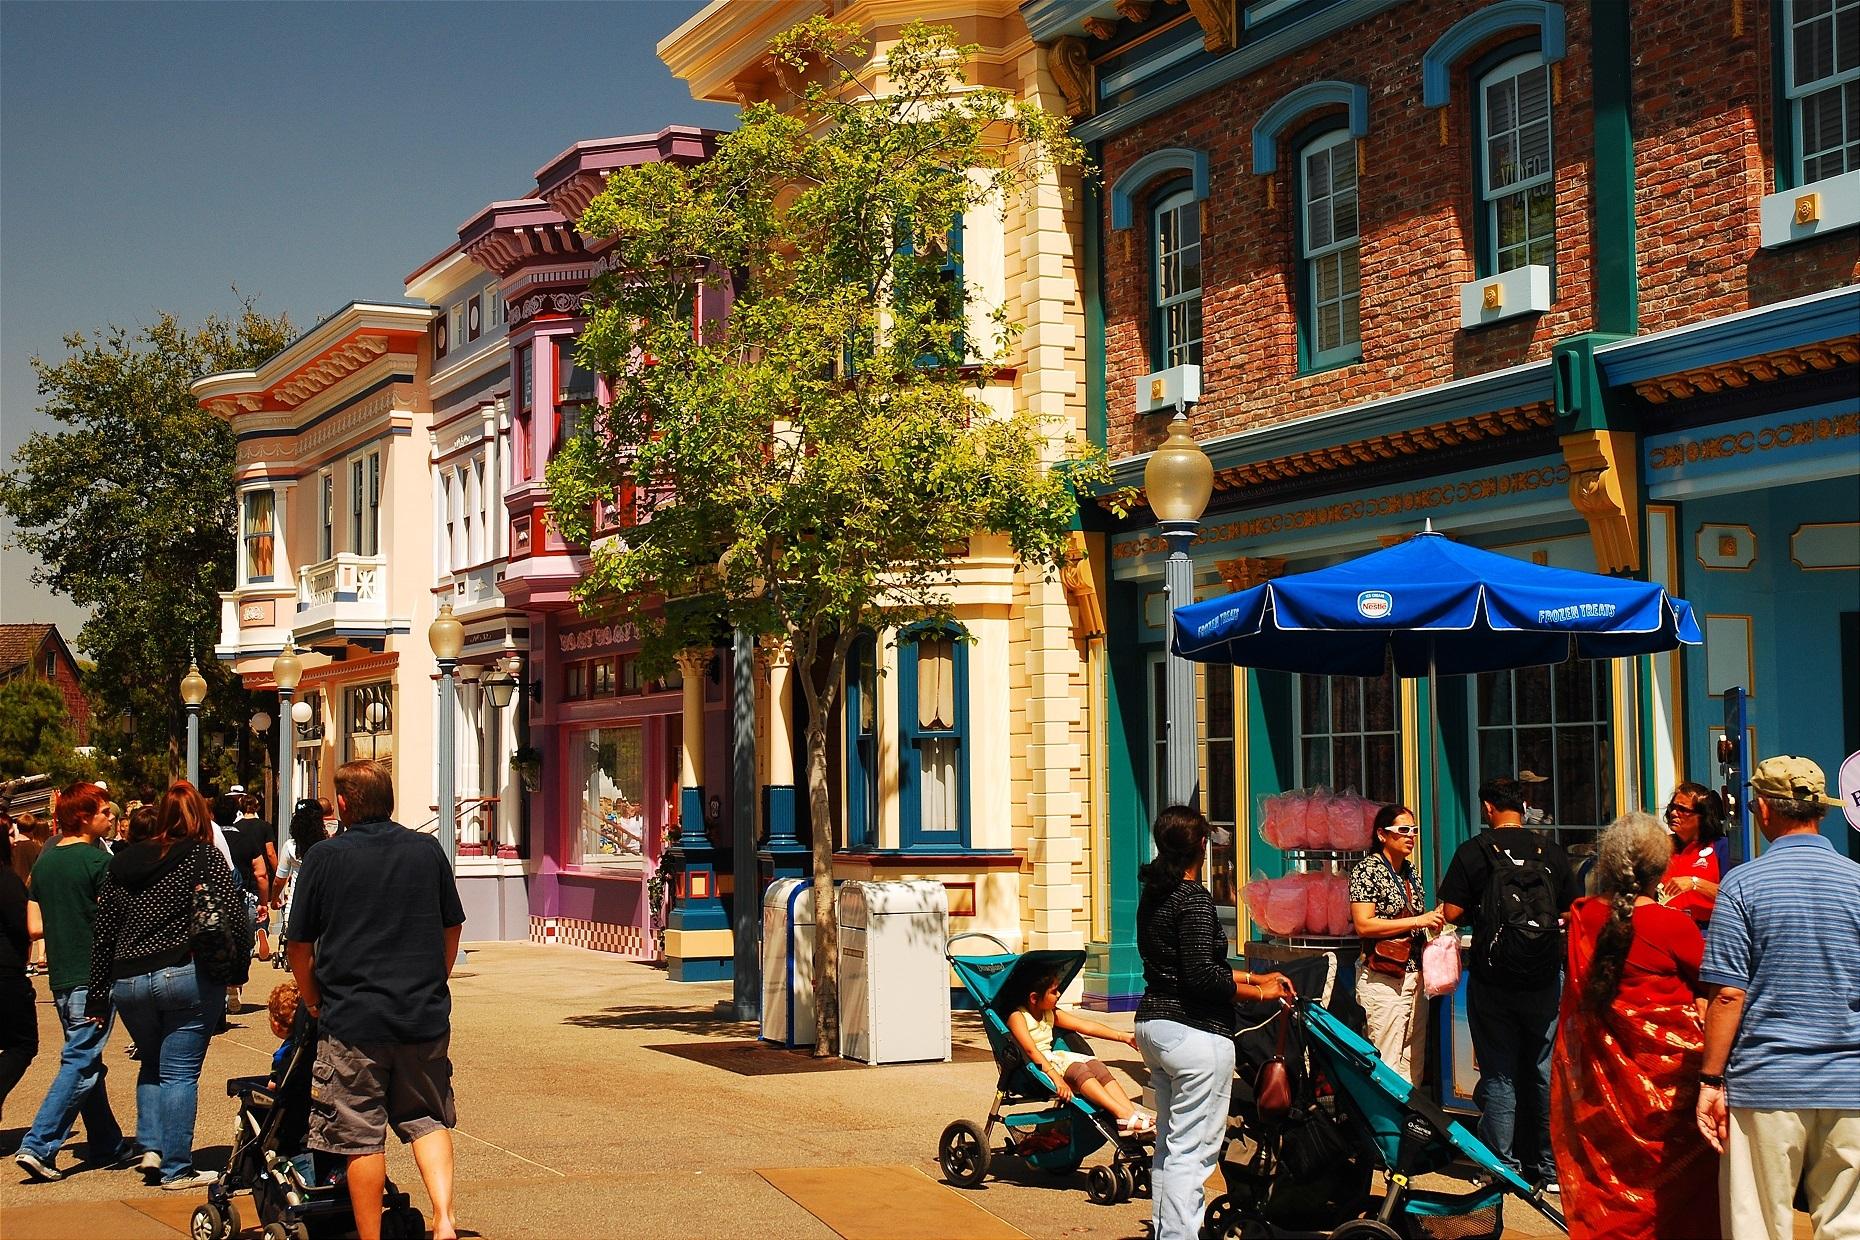 Disney main street usa in California